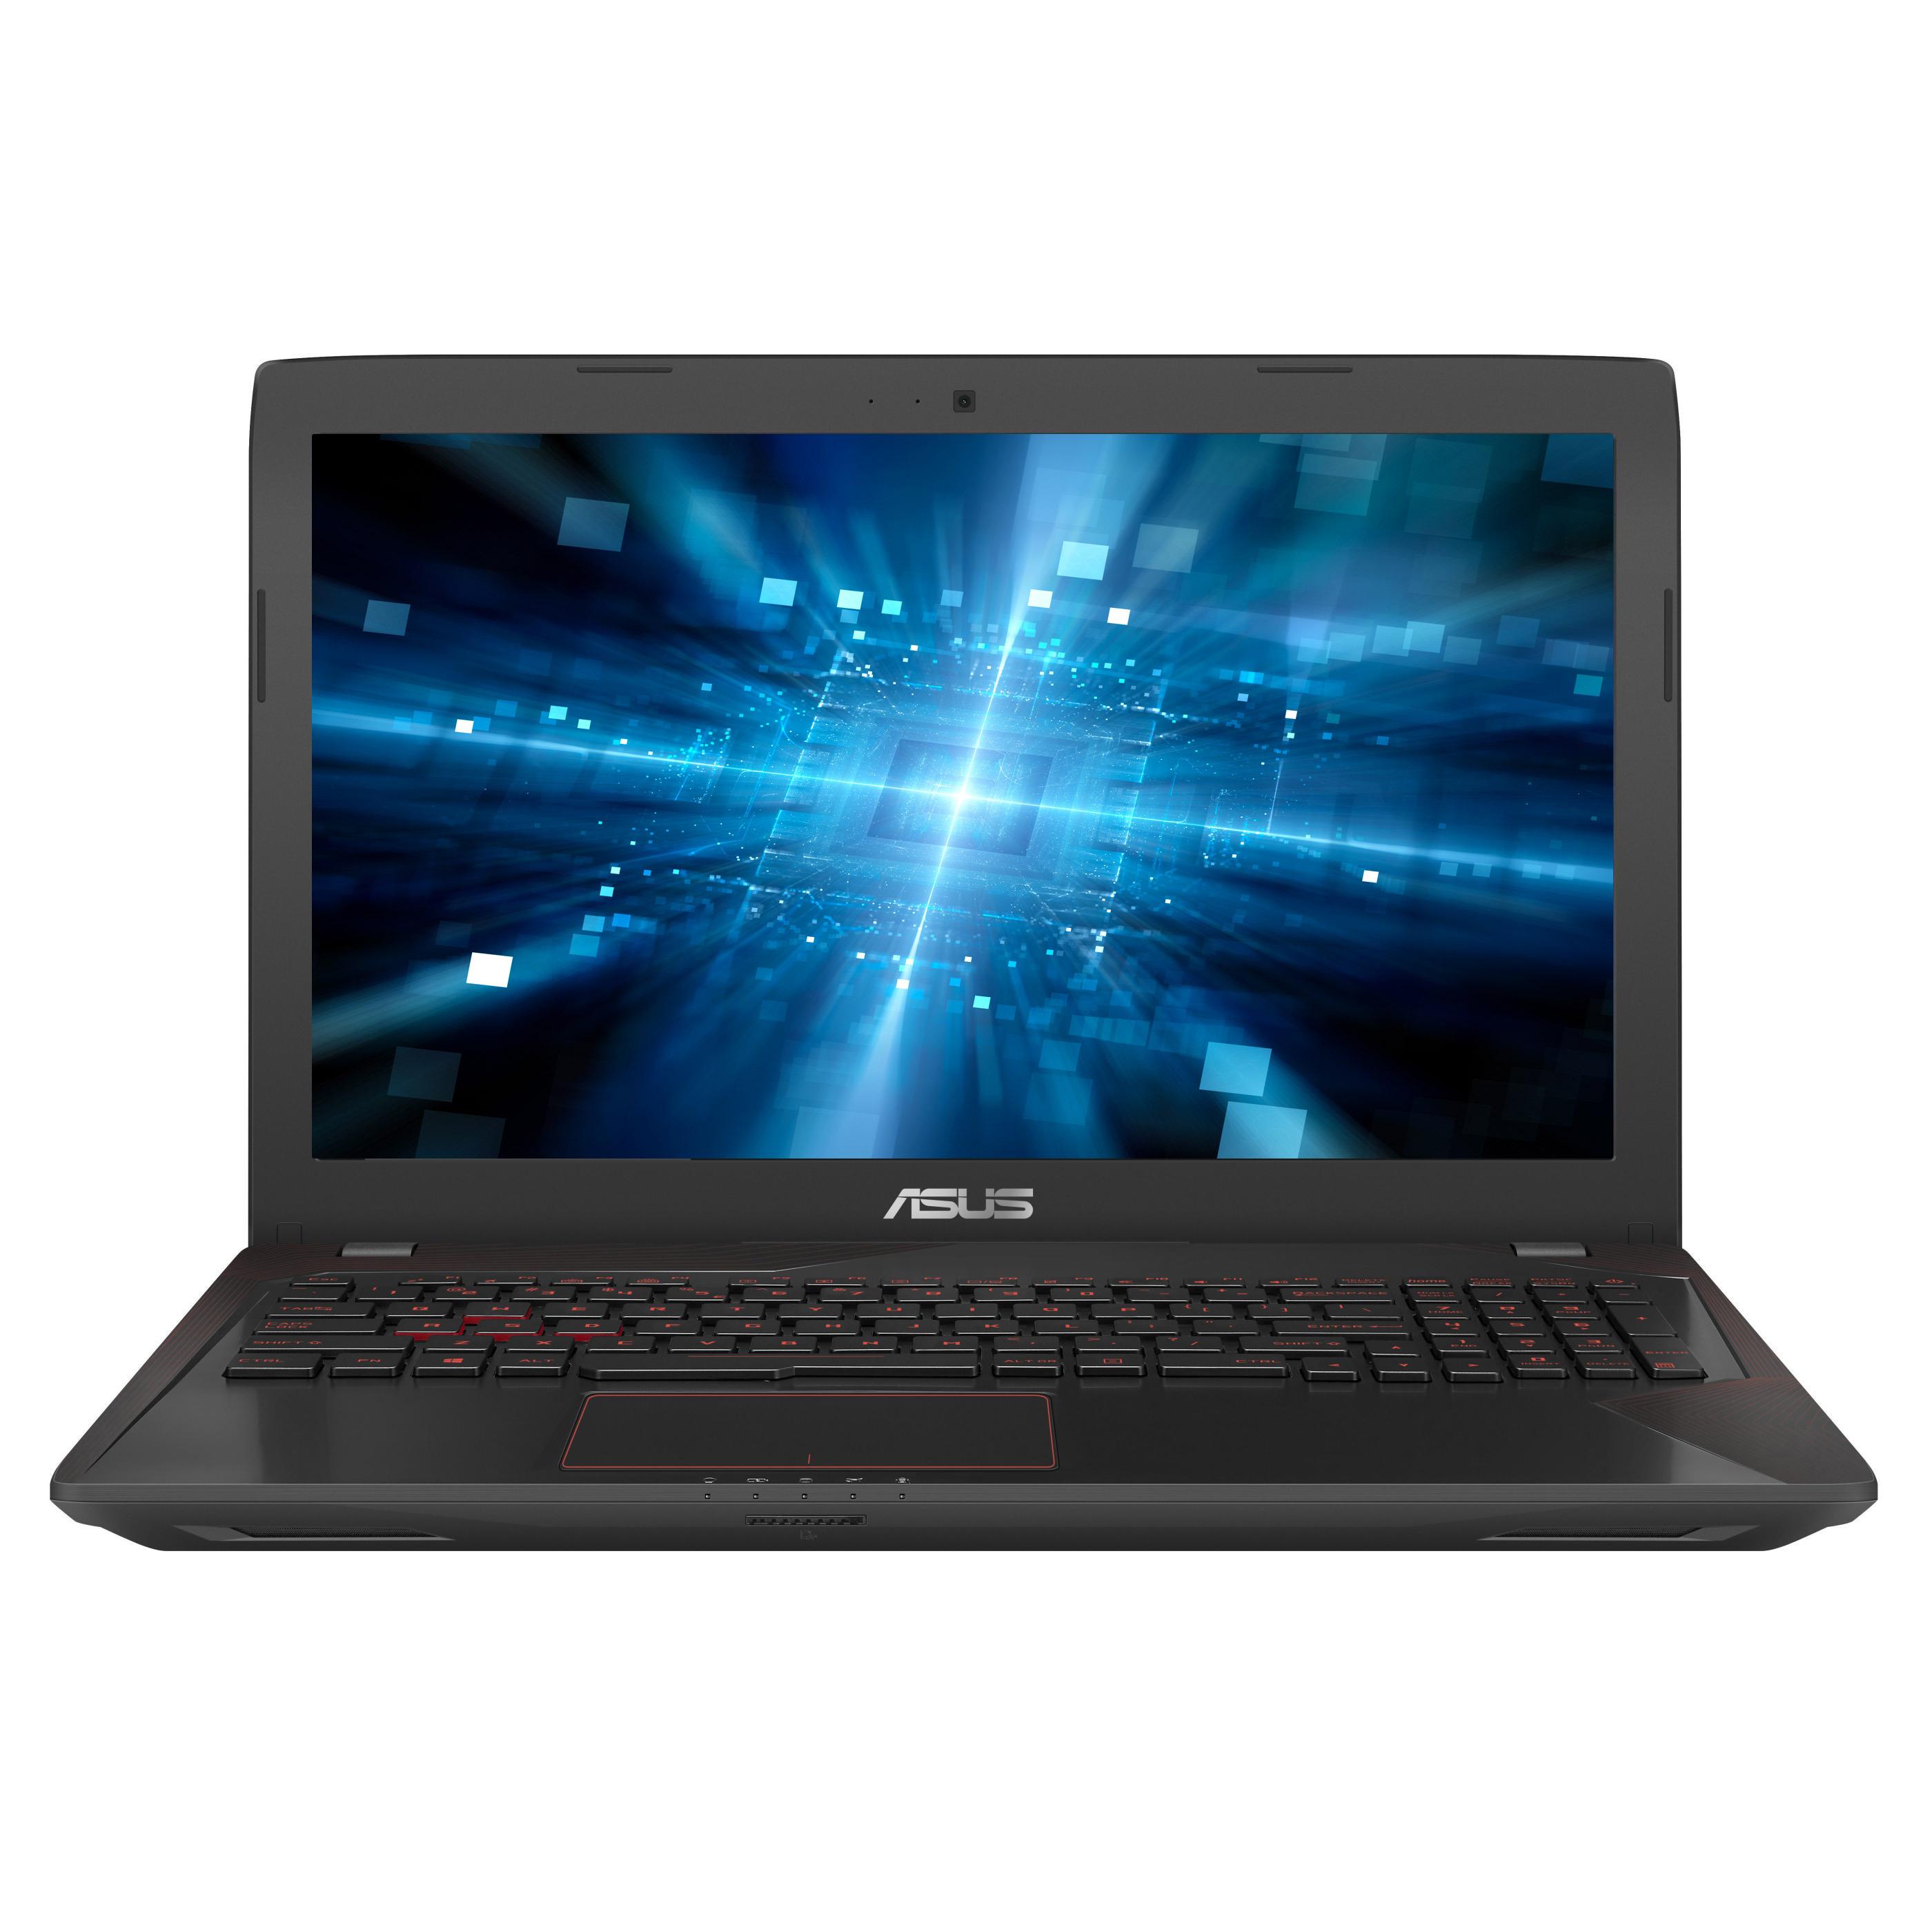 "[NBB] Asus FX553VD-DM603 Gaming Notebook 15,6"" Full-HD / Intel Core i5-7300HQ / 8GB / 1TB HDD"